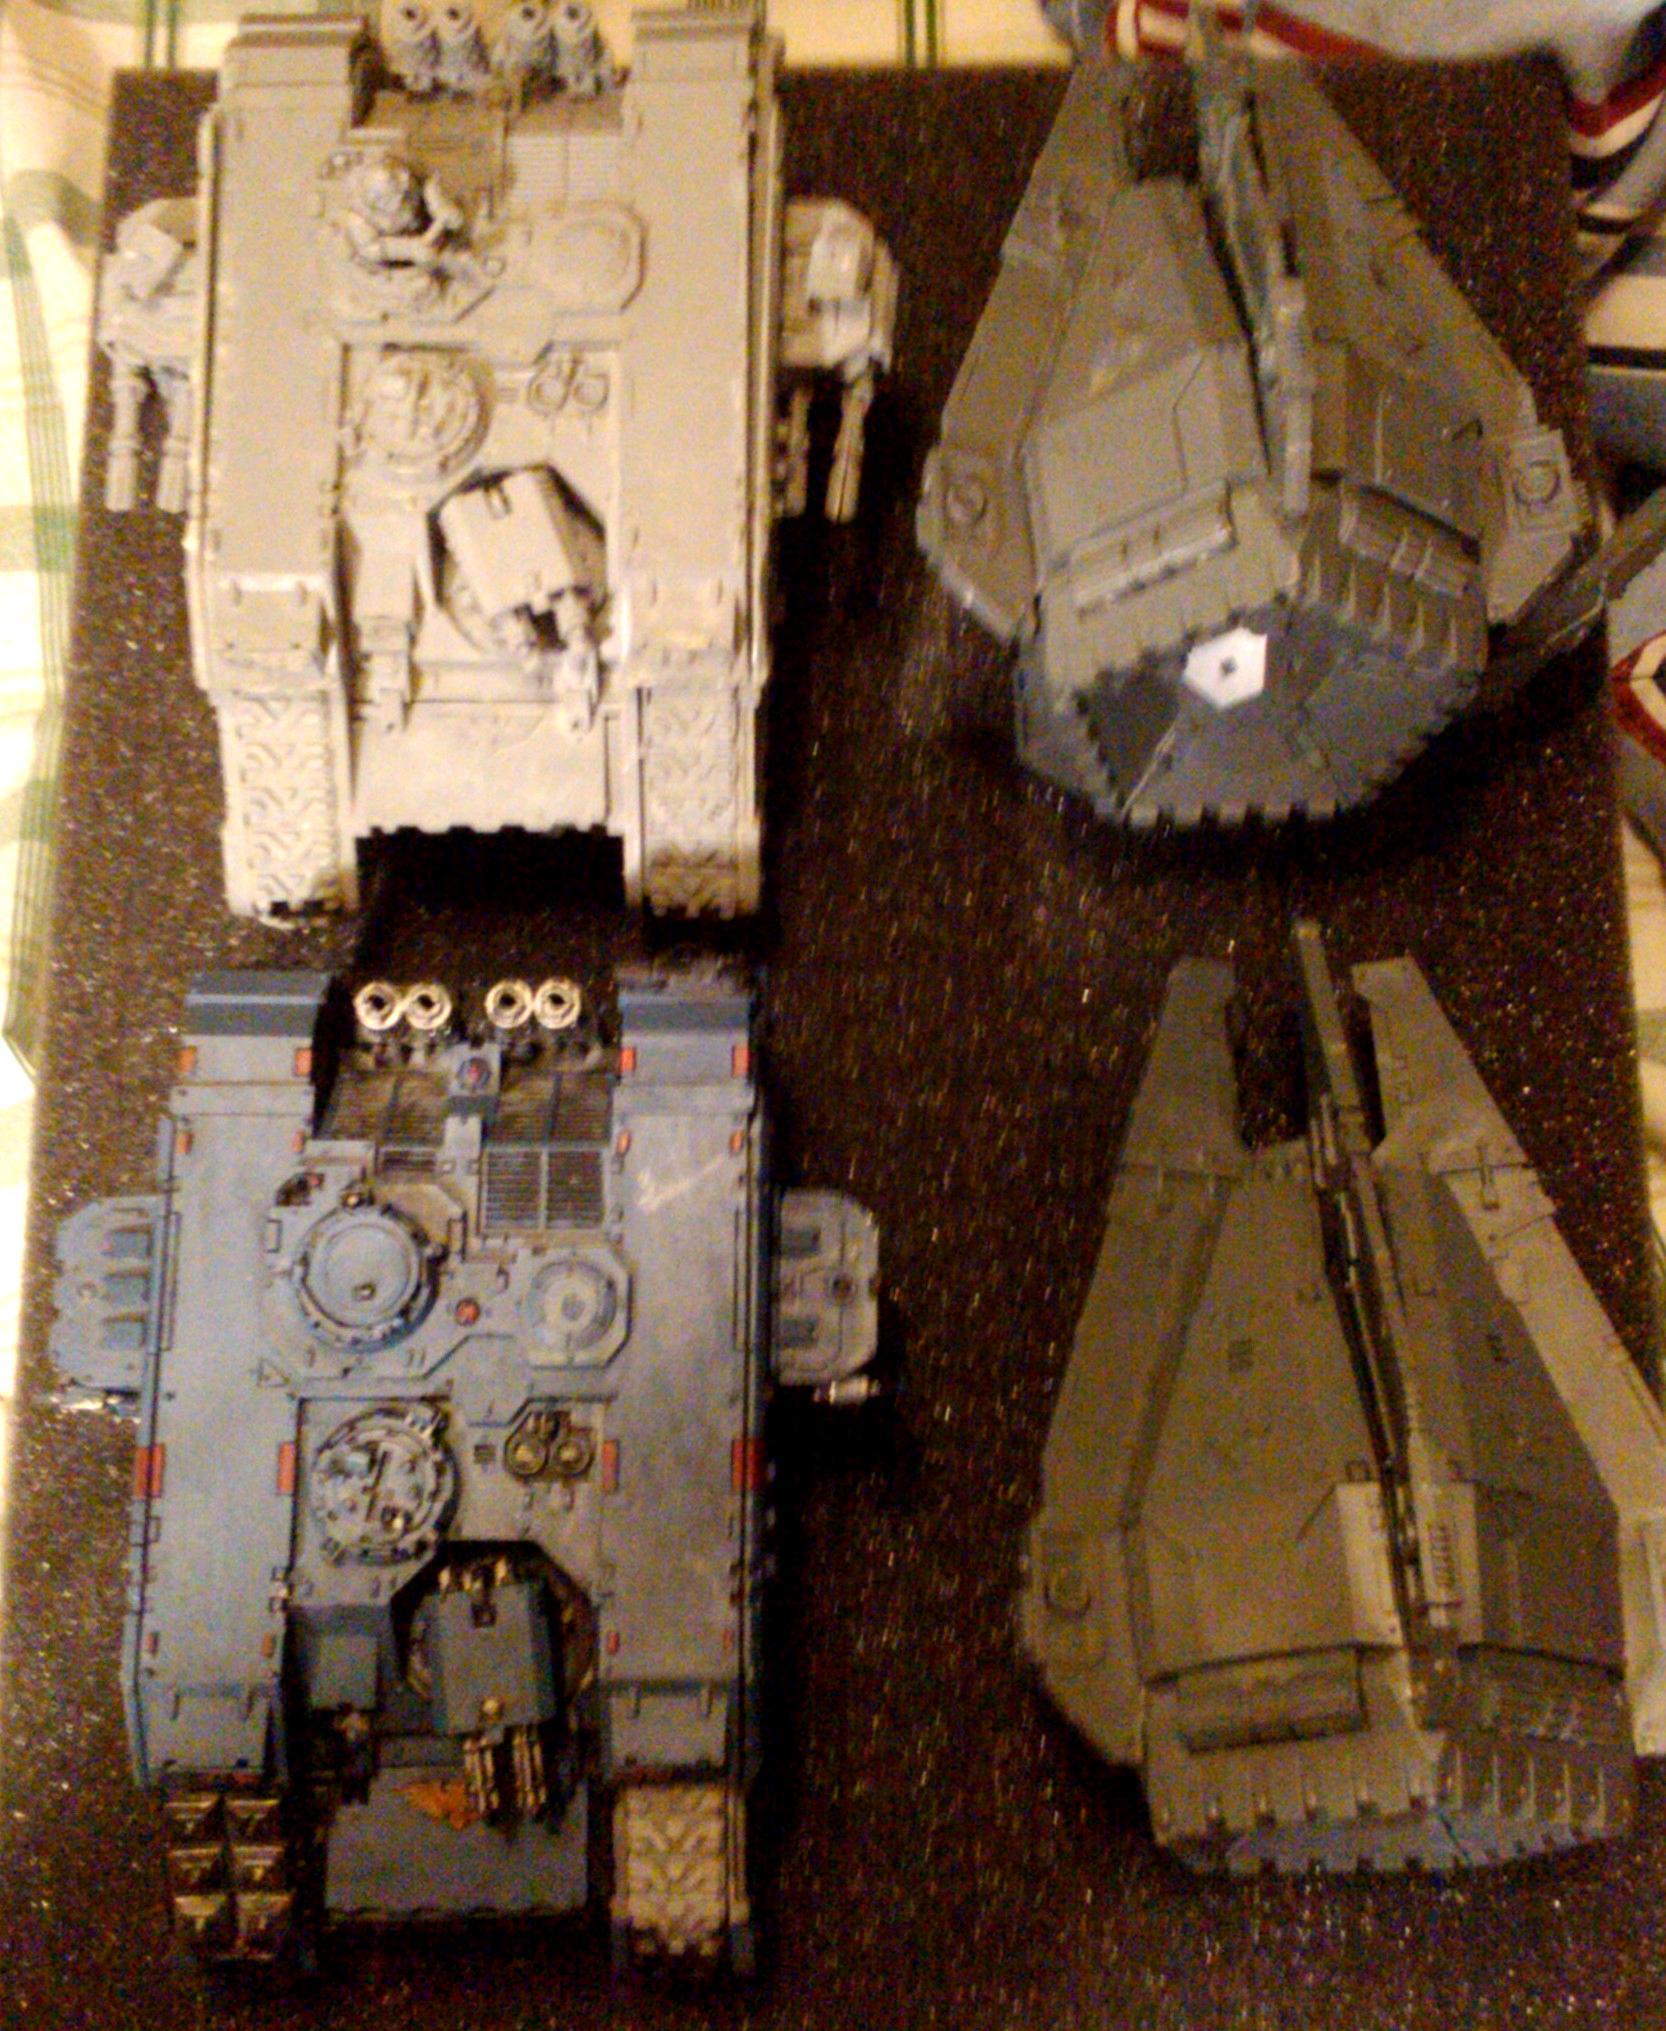 Battle Foam, Battlefoam, Conversion, Hobby, Kill Team, Scenario, Space Marines, Space Wolves, Sw